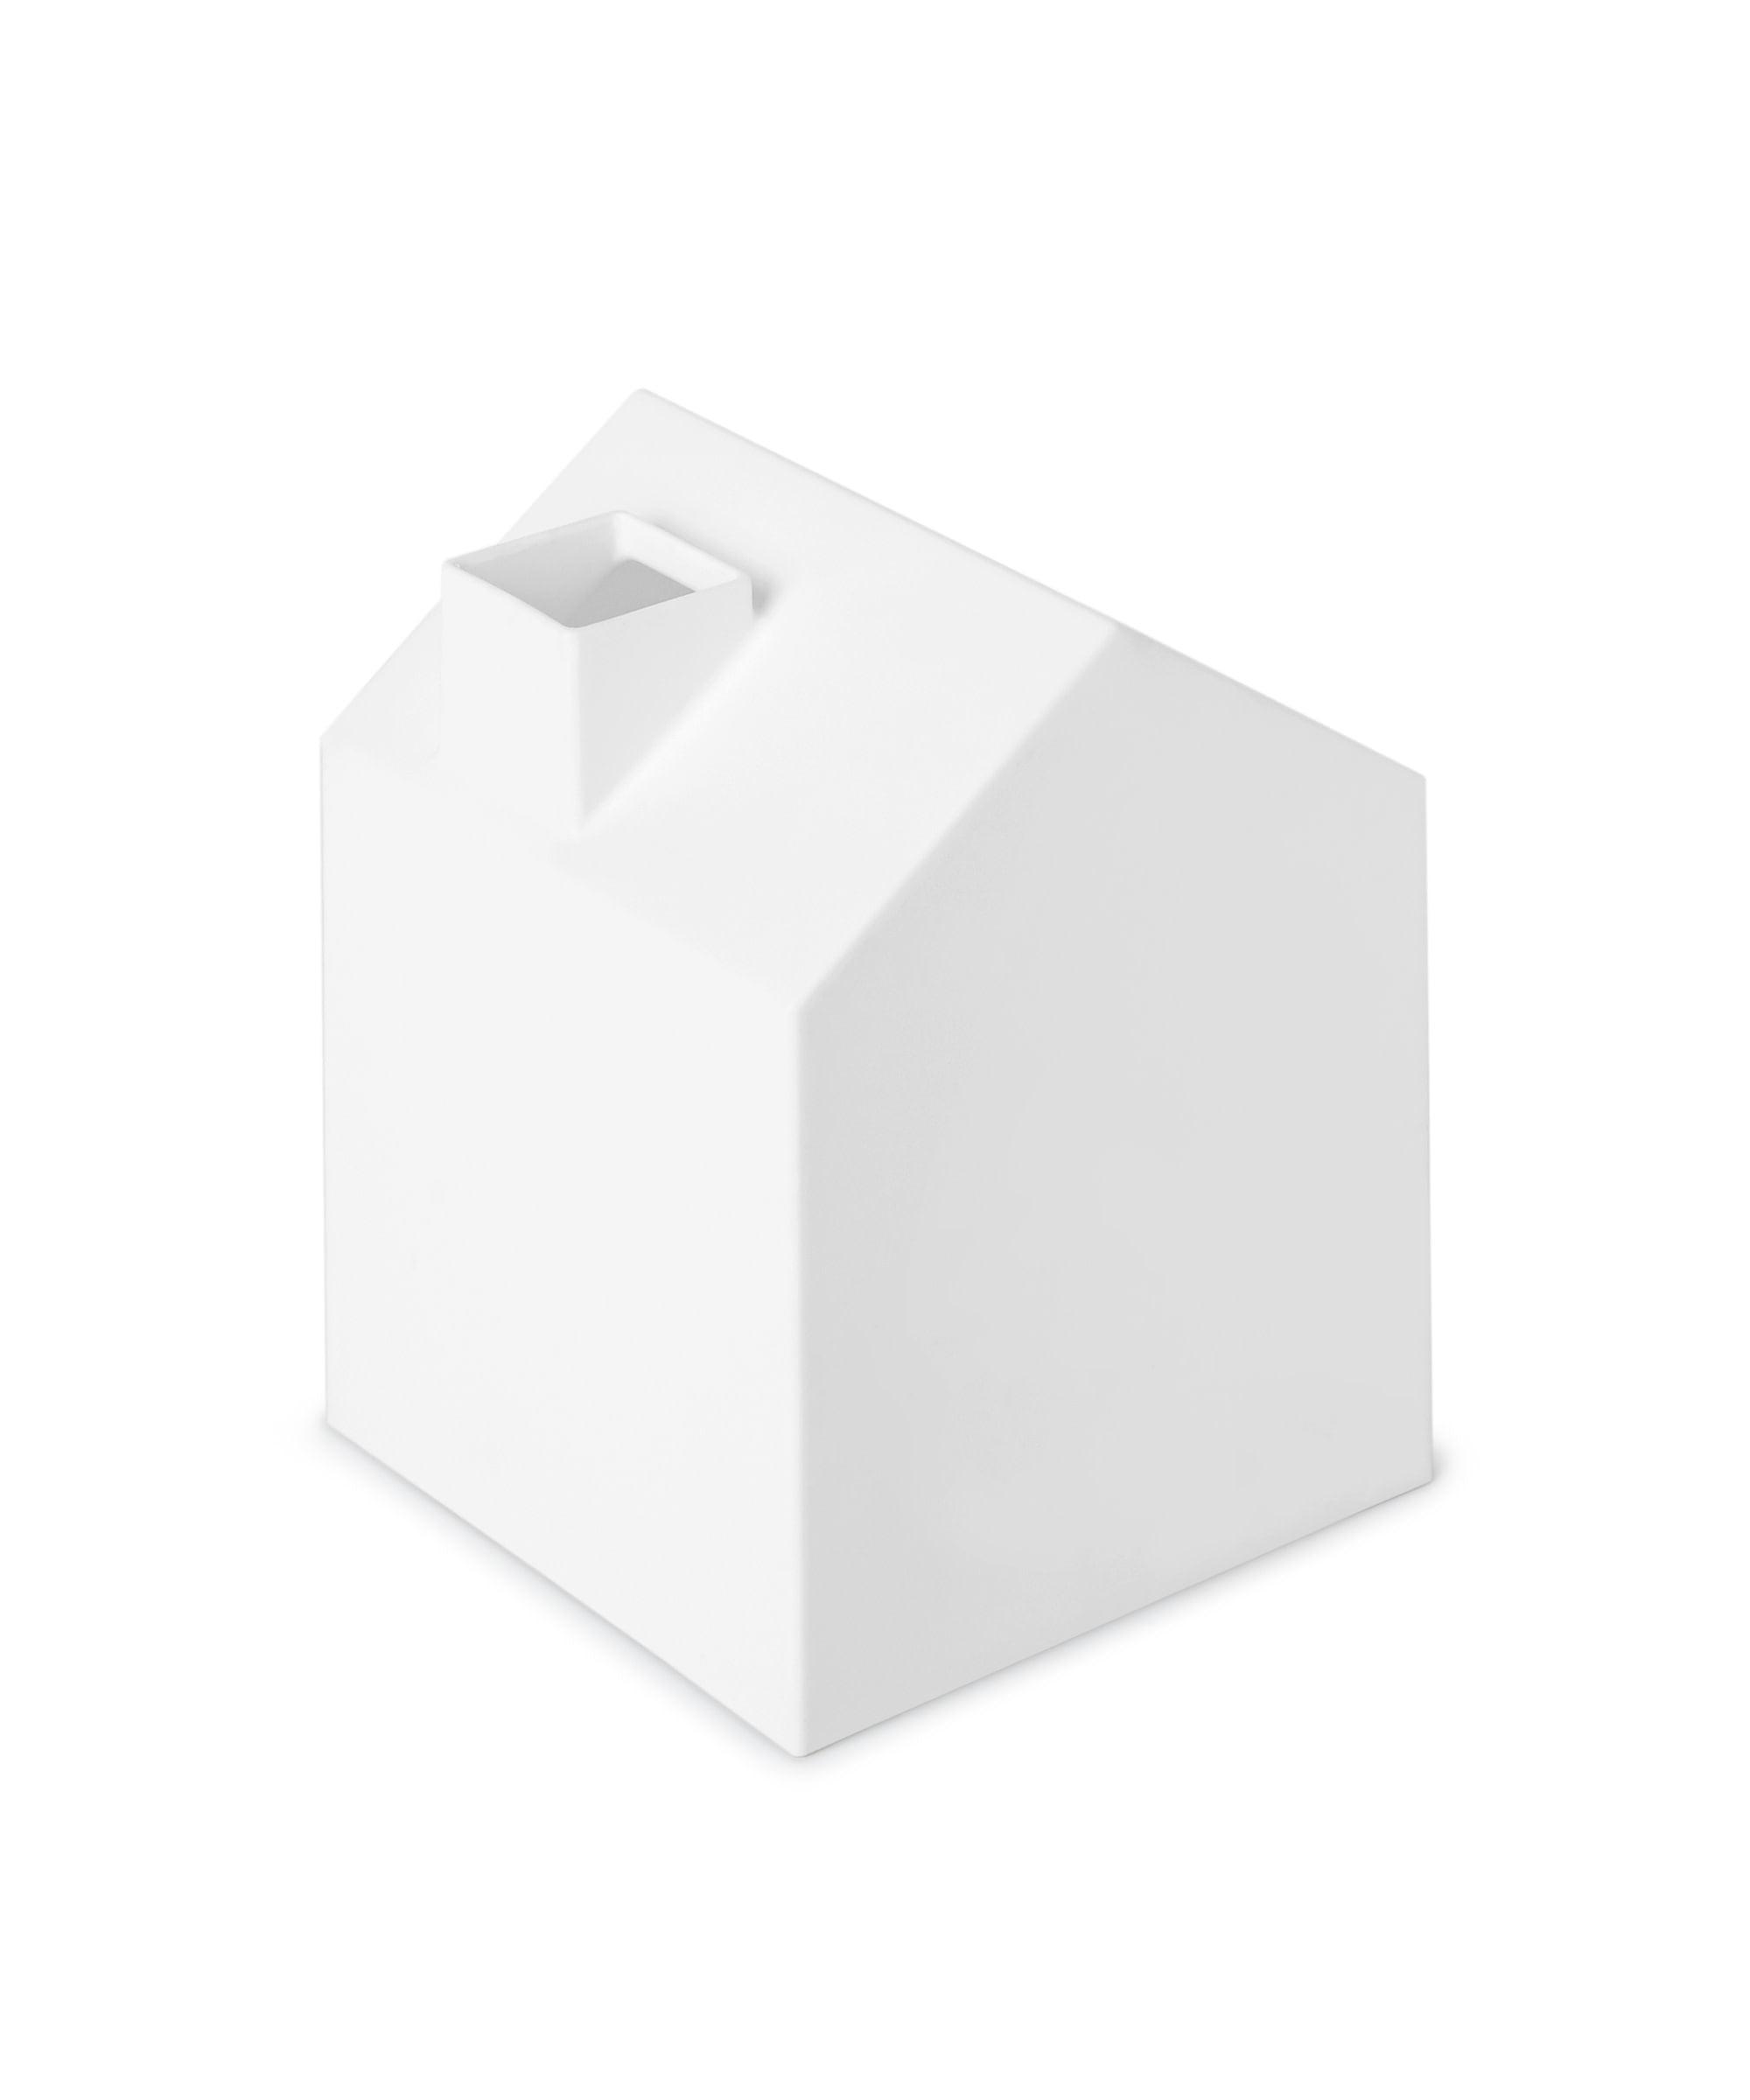 White Umbra Casa Tissue Box Cover Adorable House Shaped Square Tissue Box Holder